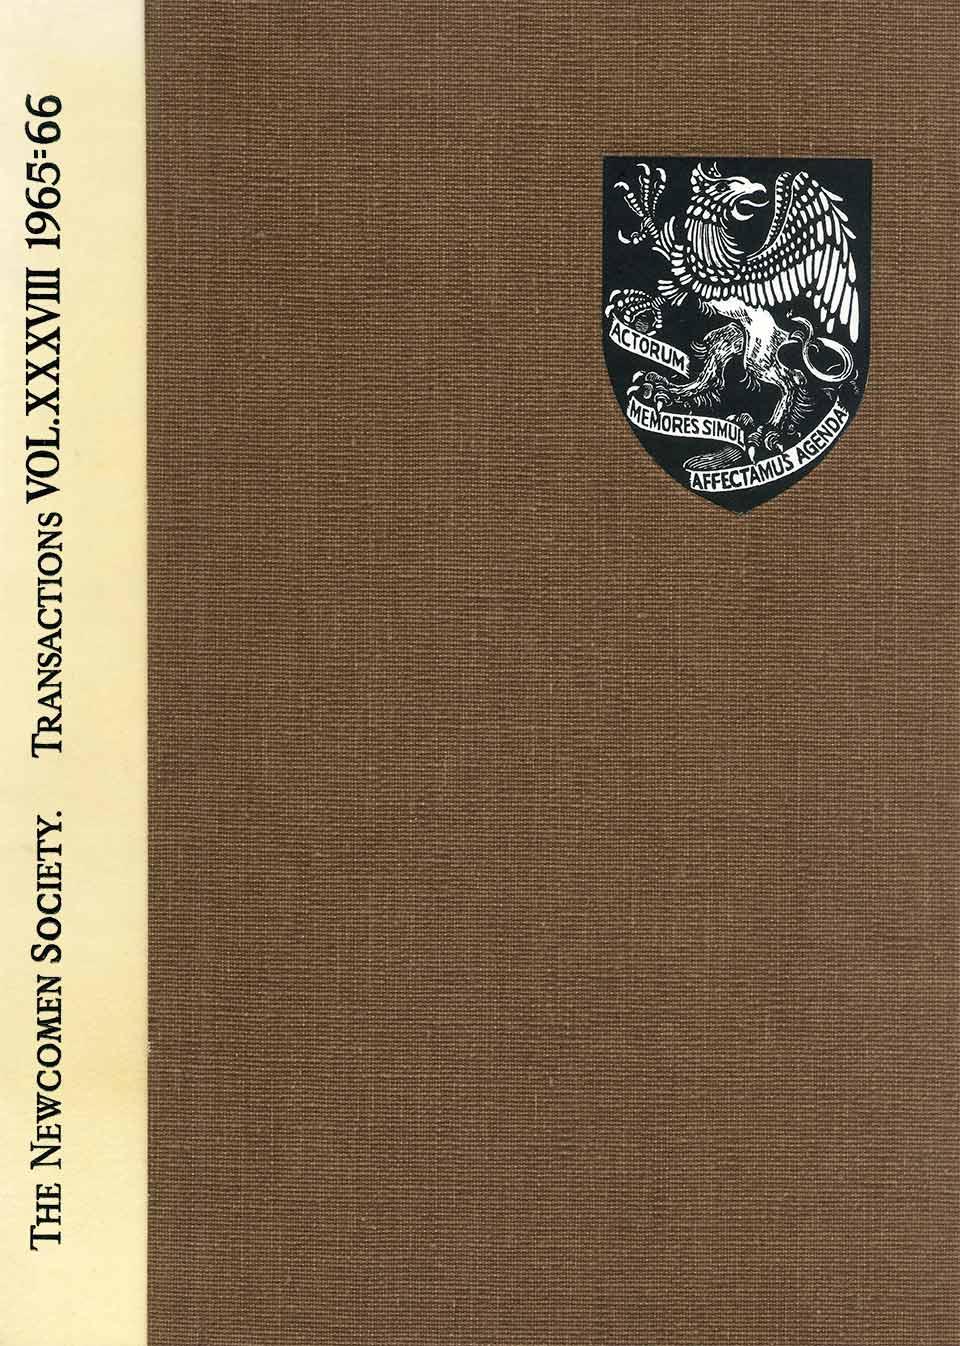 The Journal - V38 No1 1965-66 - cover Hardback